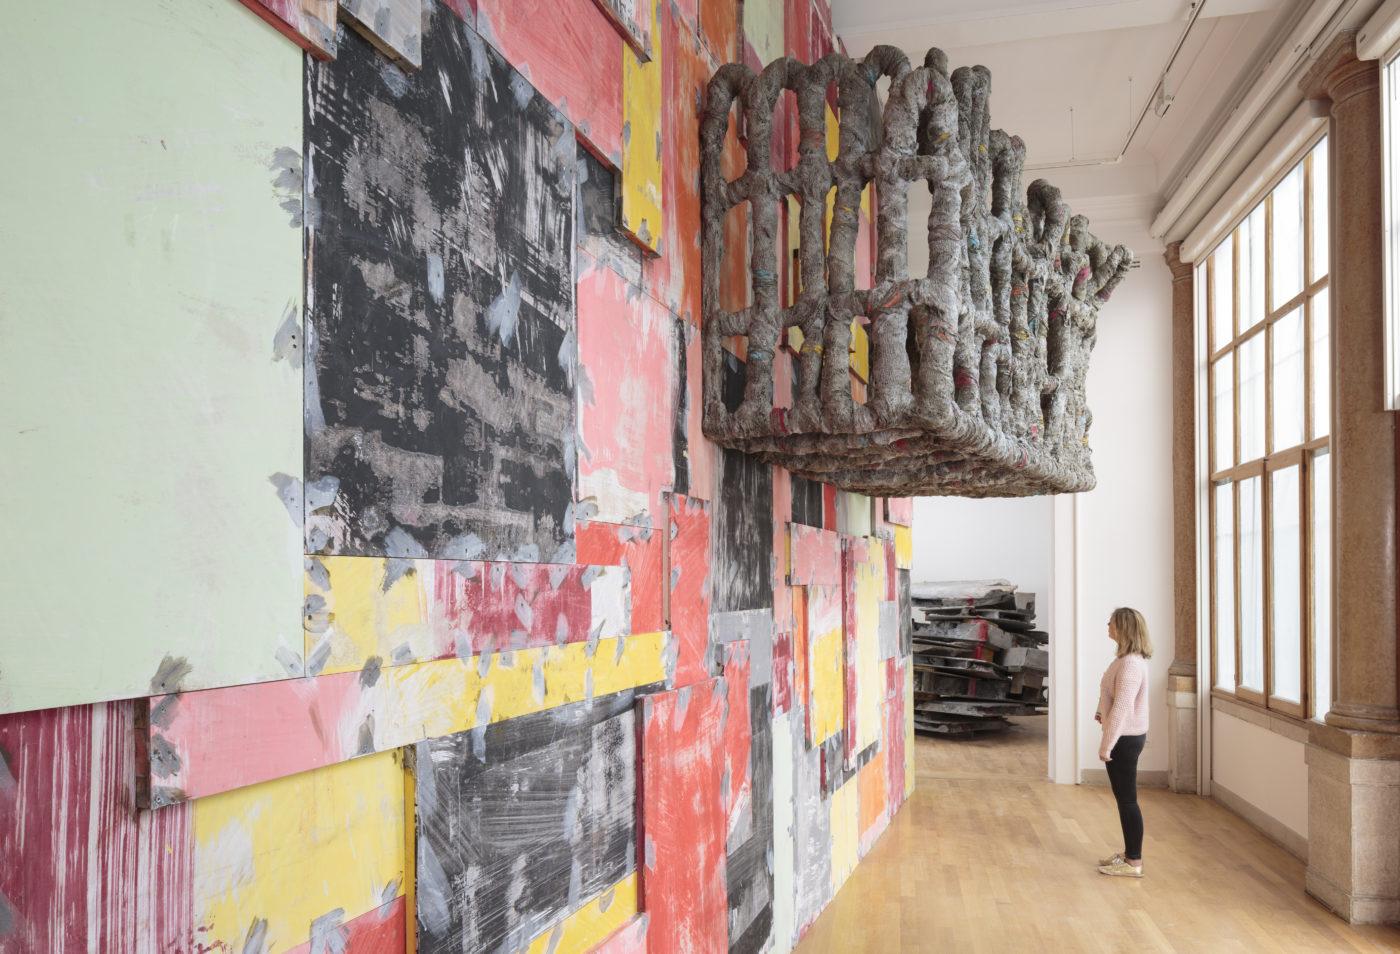 Installation view, folly, Phyllida Barlow